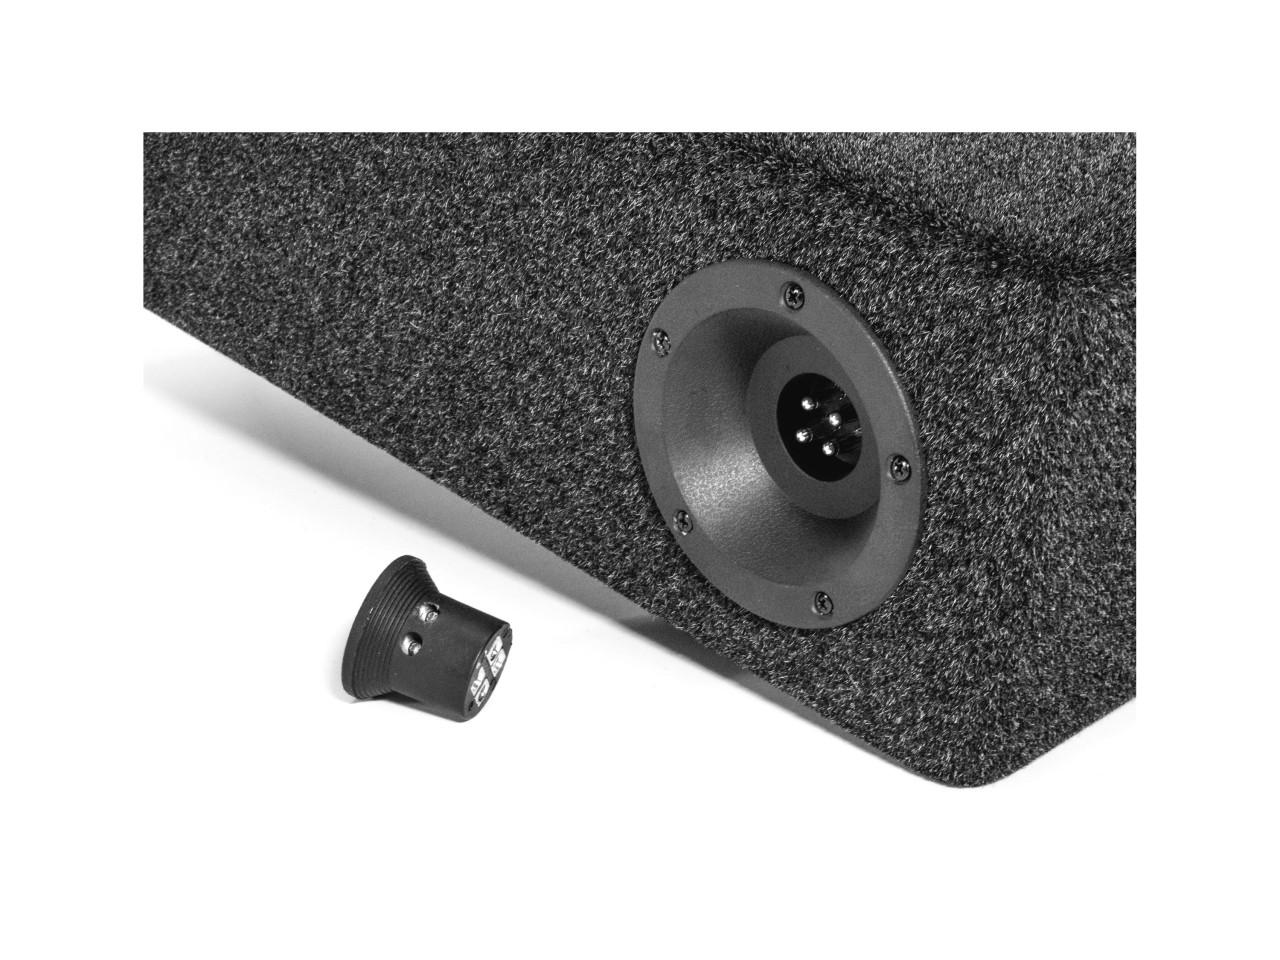 iSOtec SUB t2 | Doppel-Woofer | für die Reserverad-Mulde | 2 Ohm | BT-V